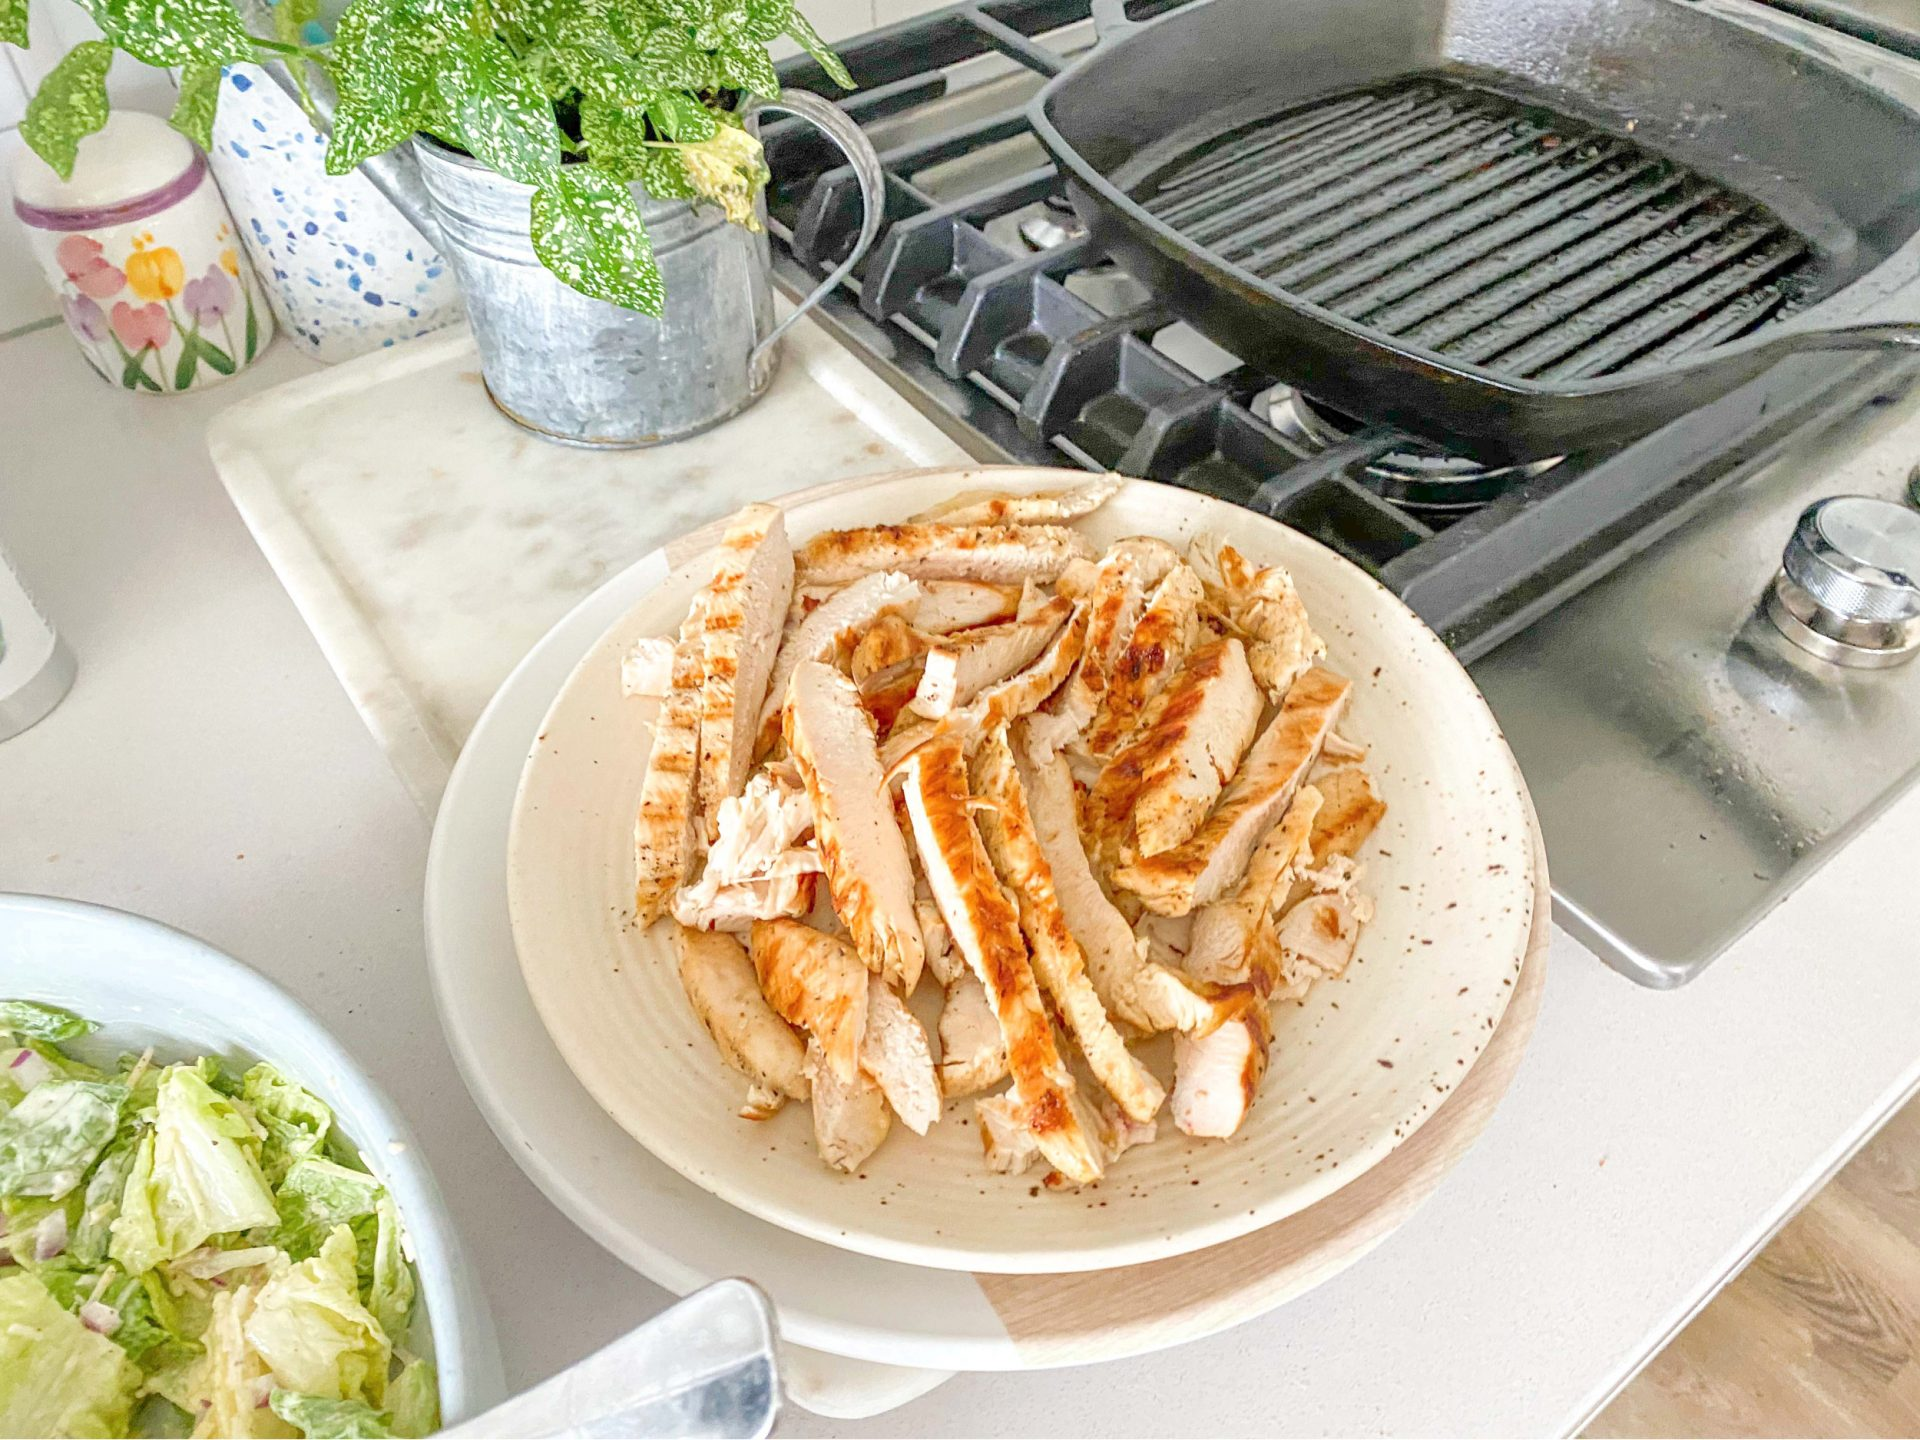 chicken, grilled chicken, caesar, chicken caesar wraps, salads, wraps, grilled, low carb, low carb chicken Caesar salad wraps, parmesan, dinner, healthy. eating, light, quick food, yum